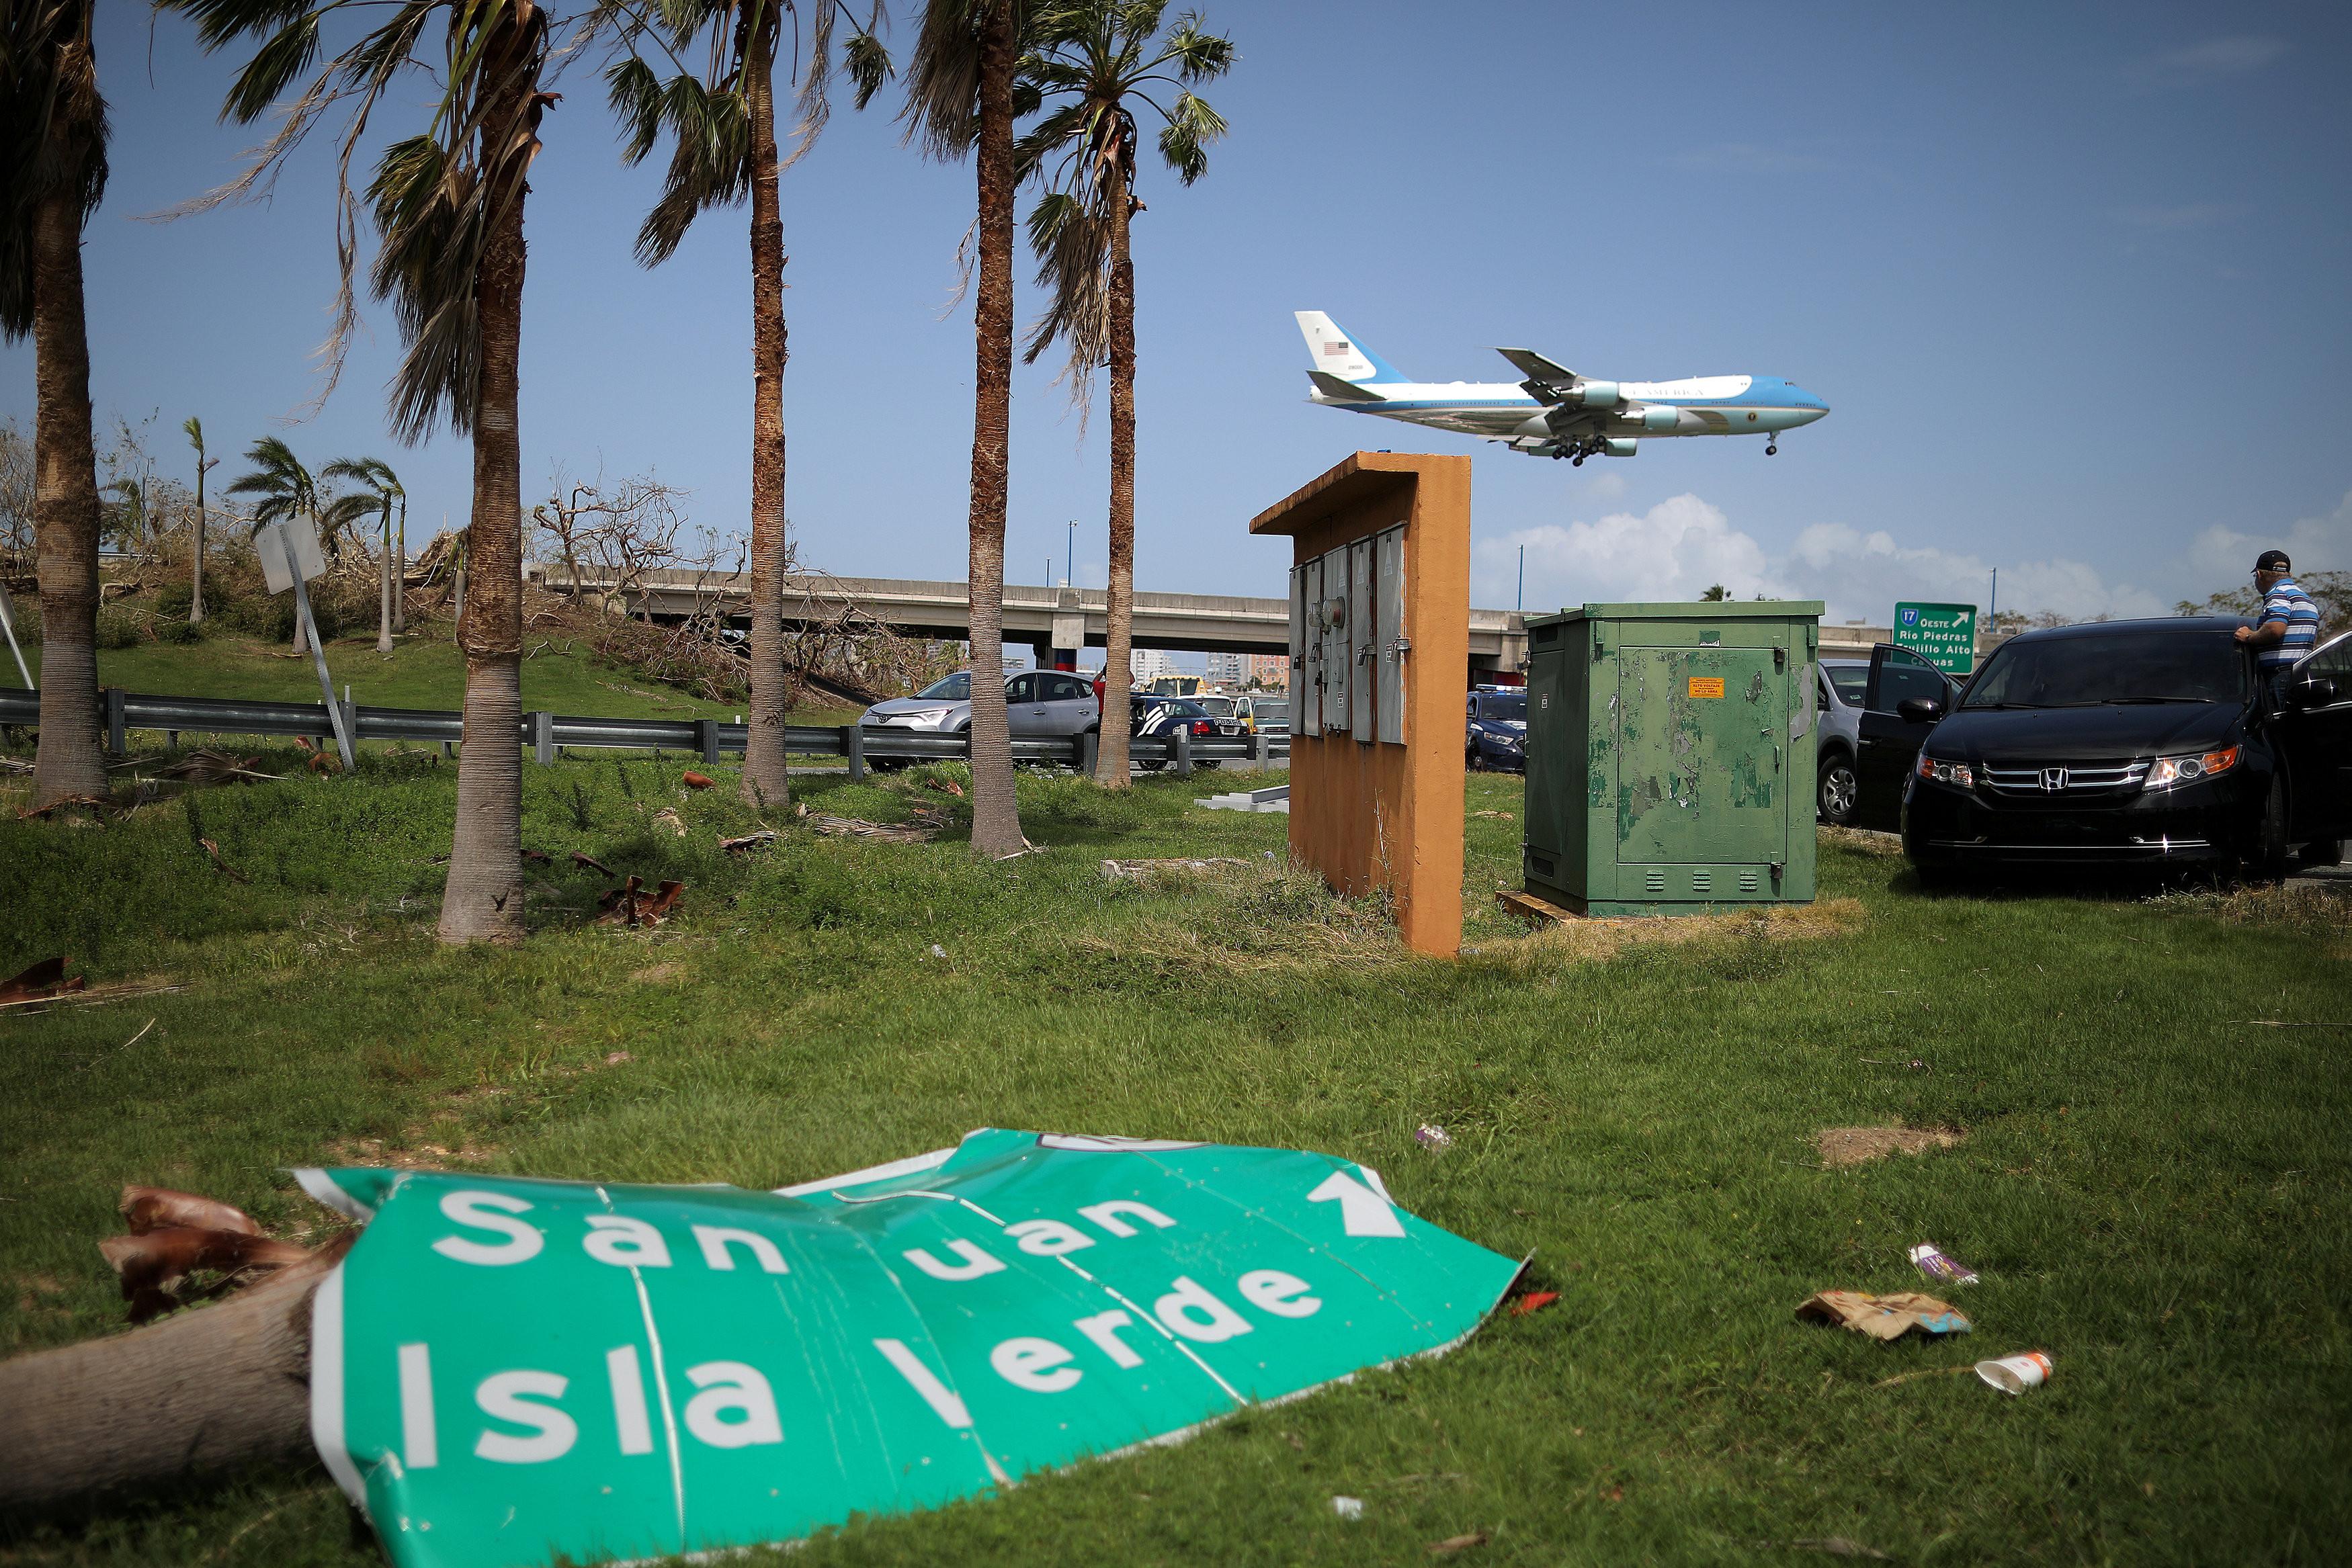 "<p>Последствия урагана ""Мария"" в Пуэрто-Рико. Фото: &copy; REUTERS/Carlos Barria</p>"